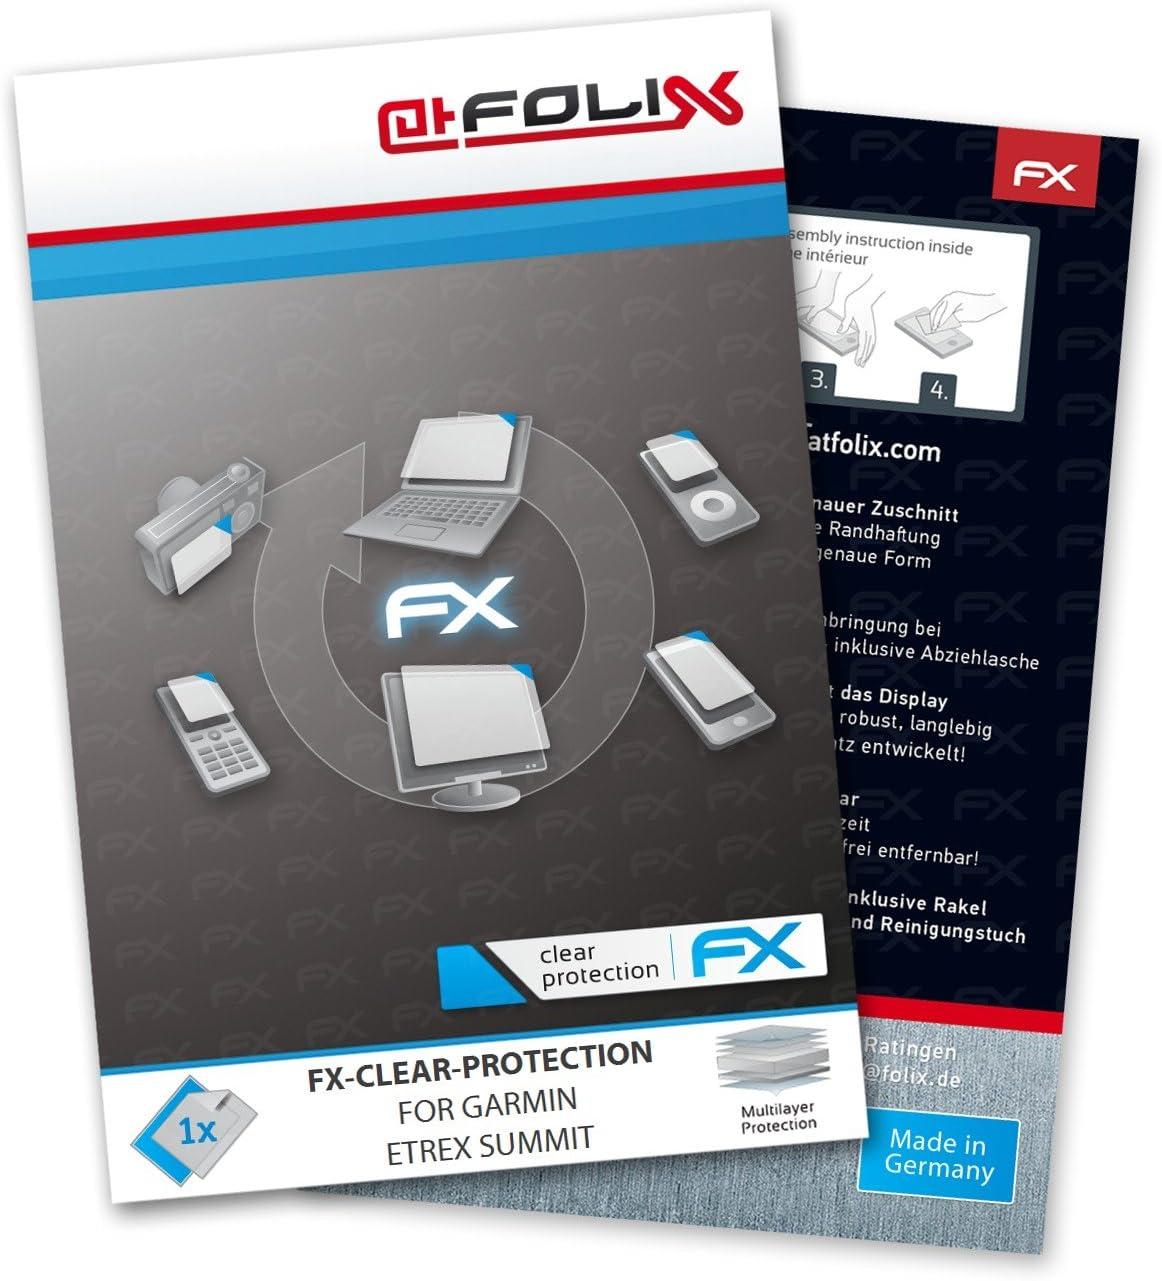 atFoliX FX-Clear, Garmin Etrex Summit Navegante 1 pieza(s) - Protector de pantalla (Garmin Etrex Summit, Navegante, Garmin, Garmin Etrex Summit, Resistente a rayones, Transparente, 1 pieza(s))